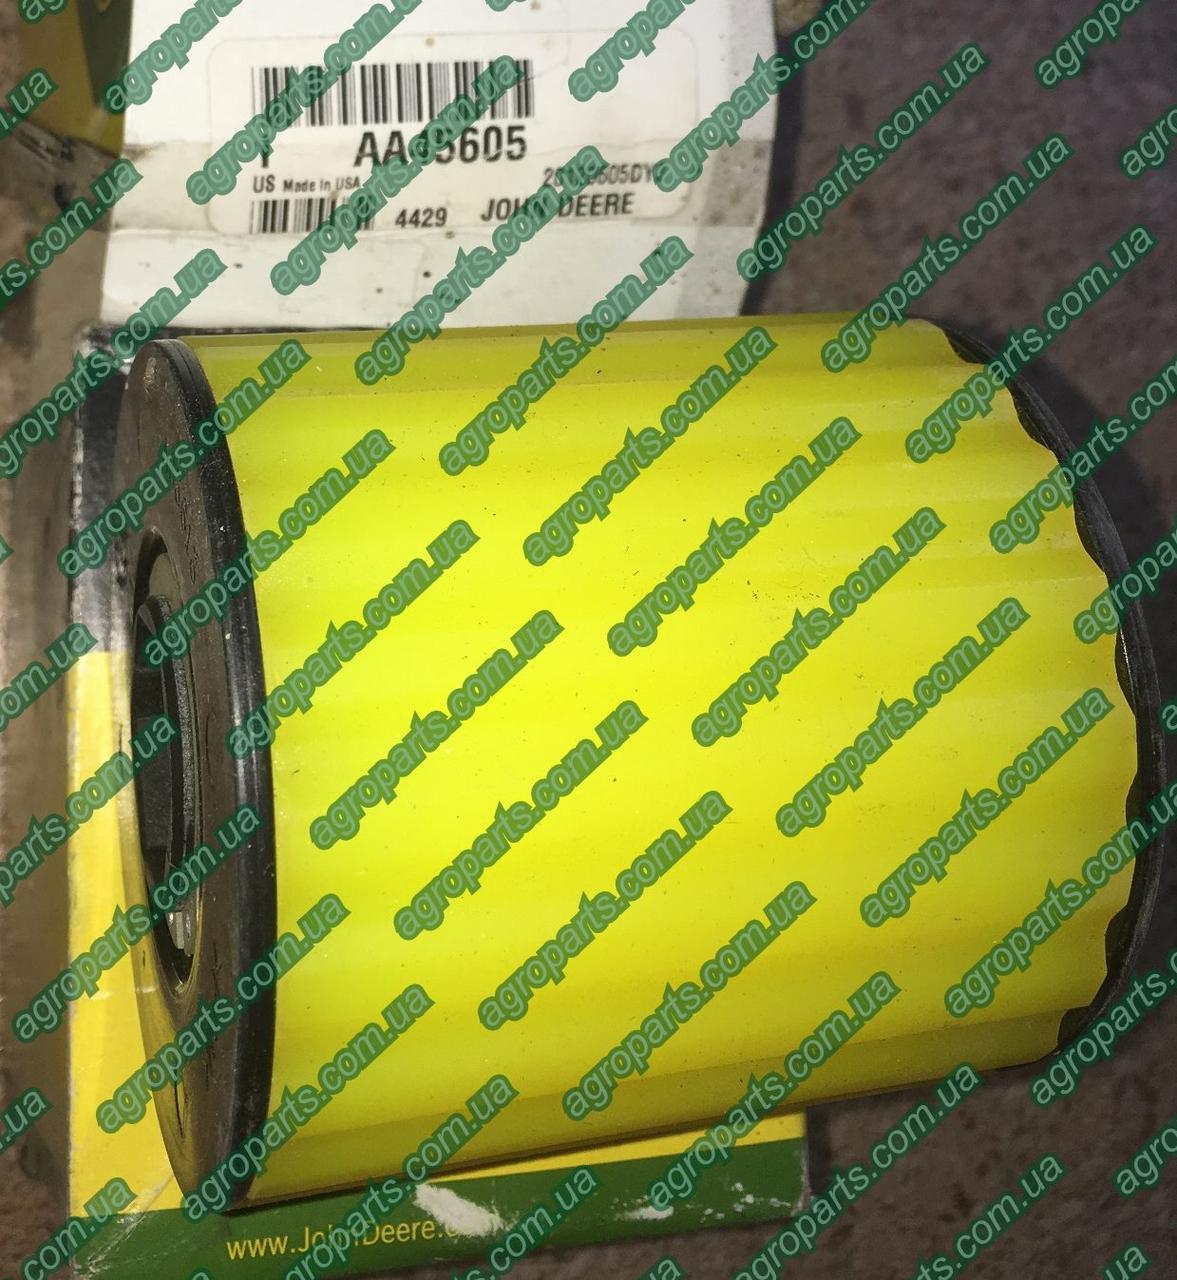 Катушка AA45605 высева желтая  INSERT, LOW ROLLER SEED METERJohn Deere AA45605 Yellow